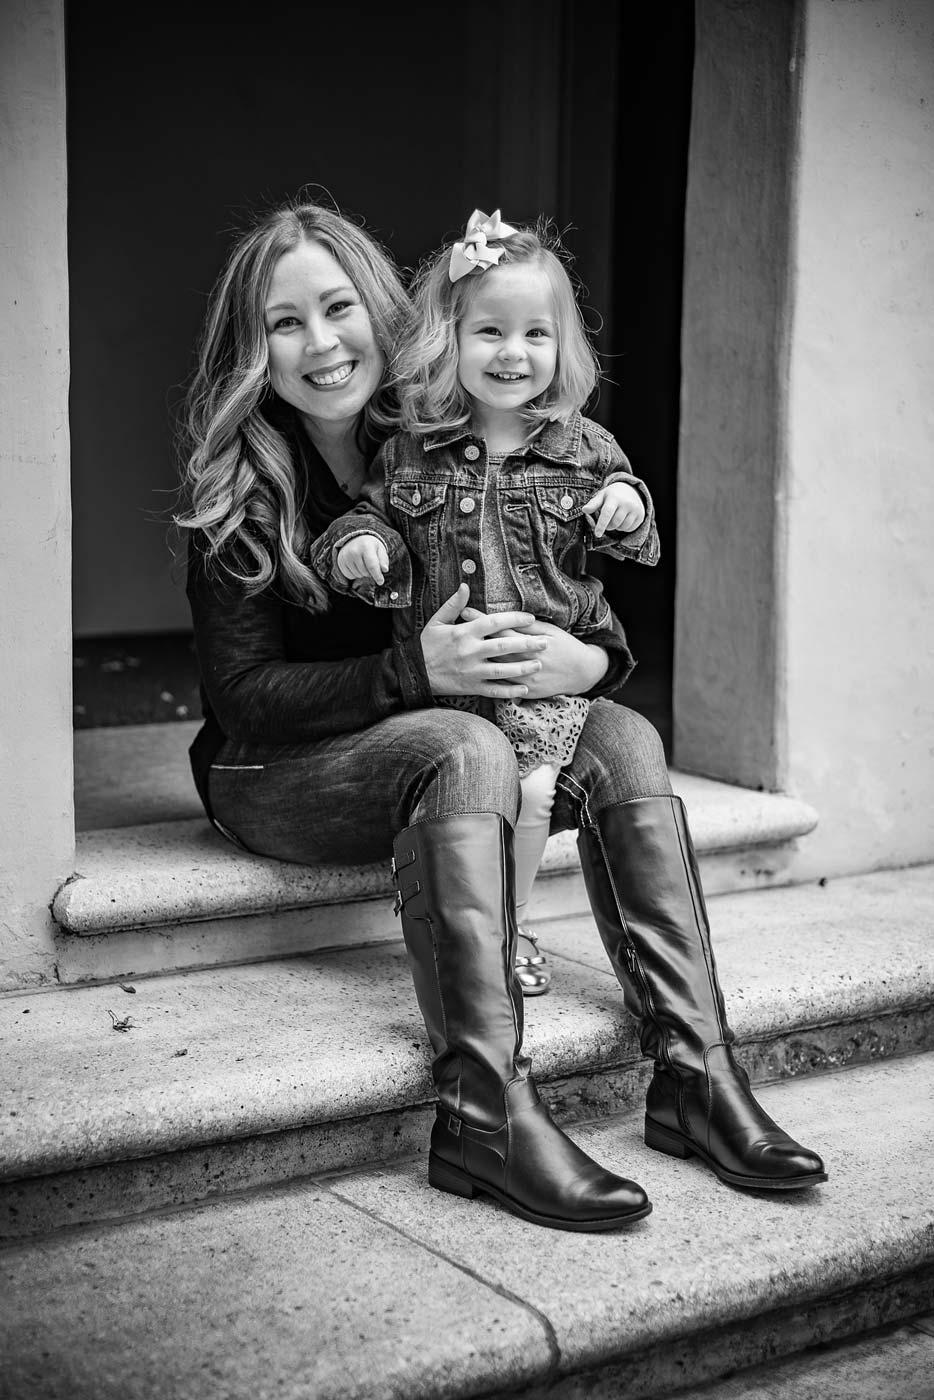 sMiss-Emma-and-Family---2-Years---Jan-2016-43.jpg